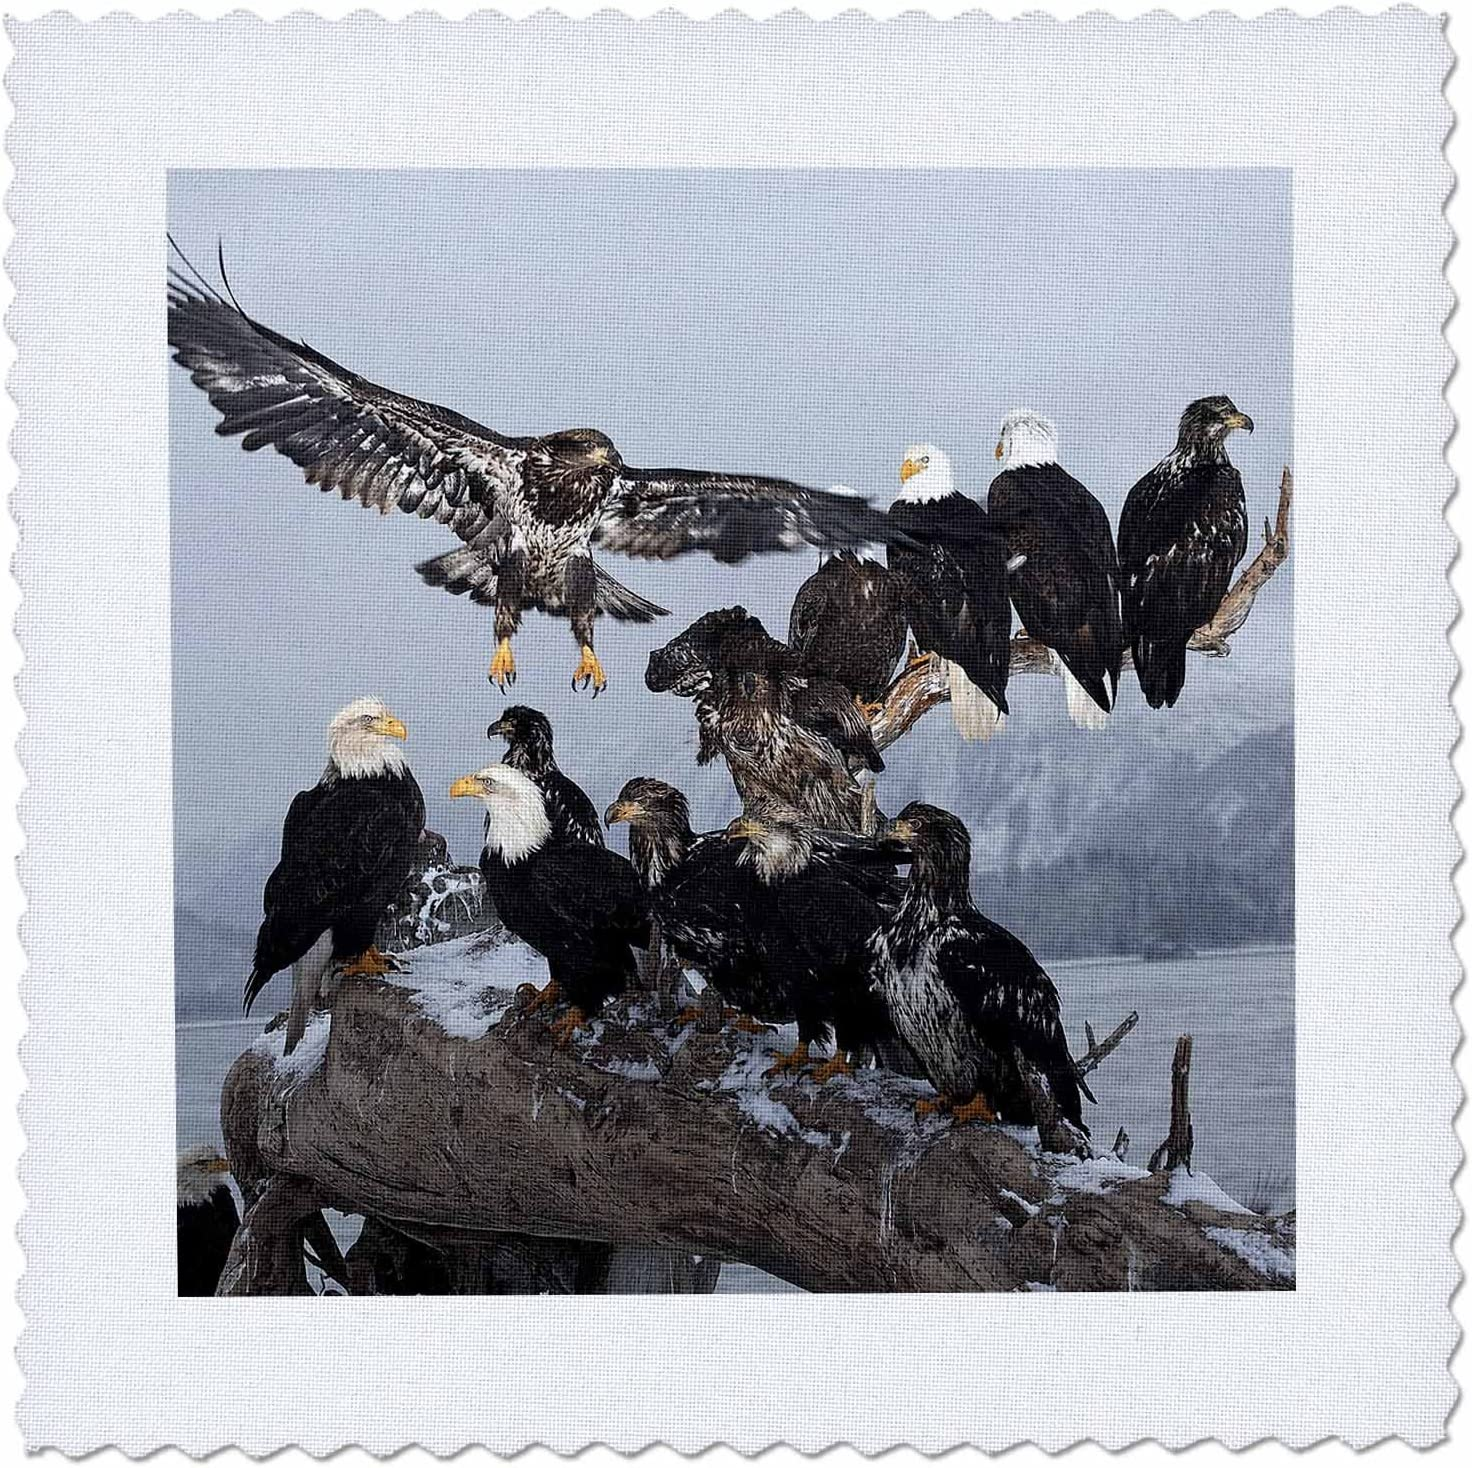 Max 82% OFF 3dRose Sea Otter Wildlife Shells Seward Na02 Alaska - Fixed price for sale Rnu0780